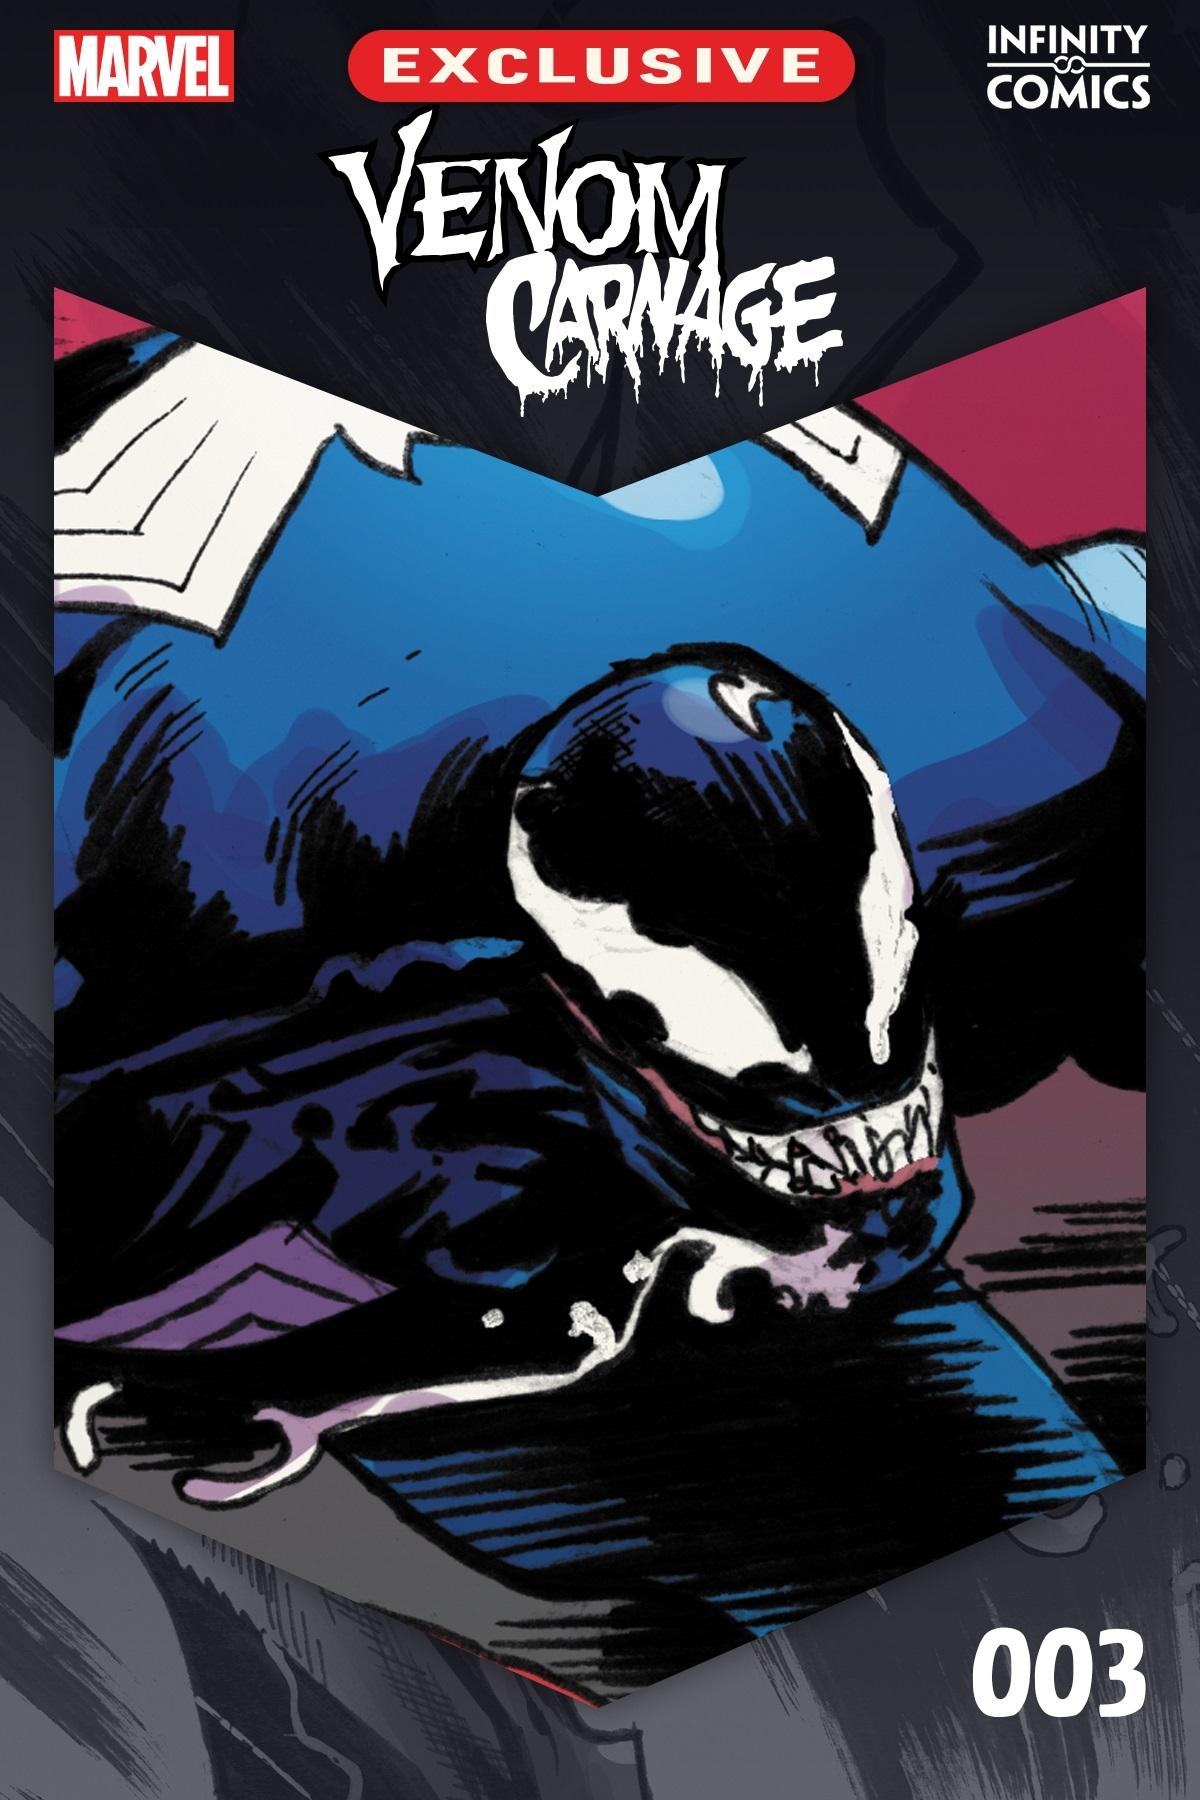 Venom/Carnage Infinity Comic (2021) #3